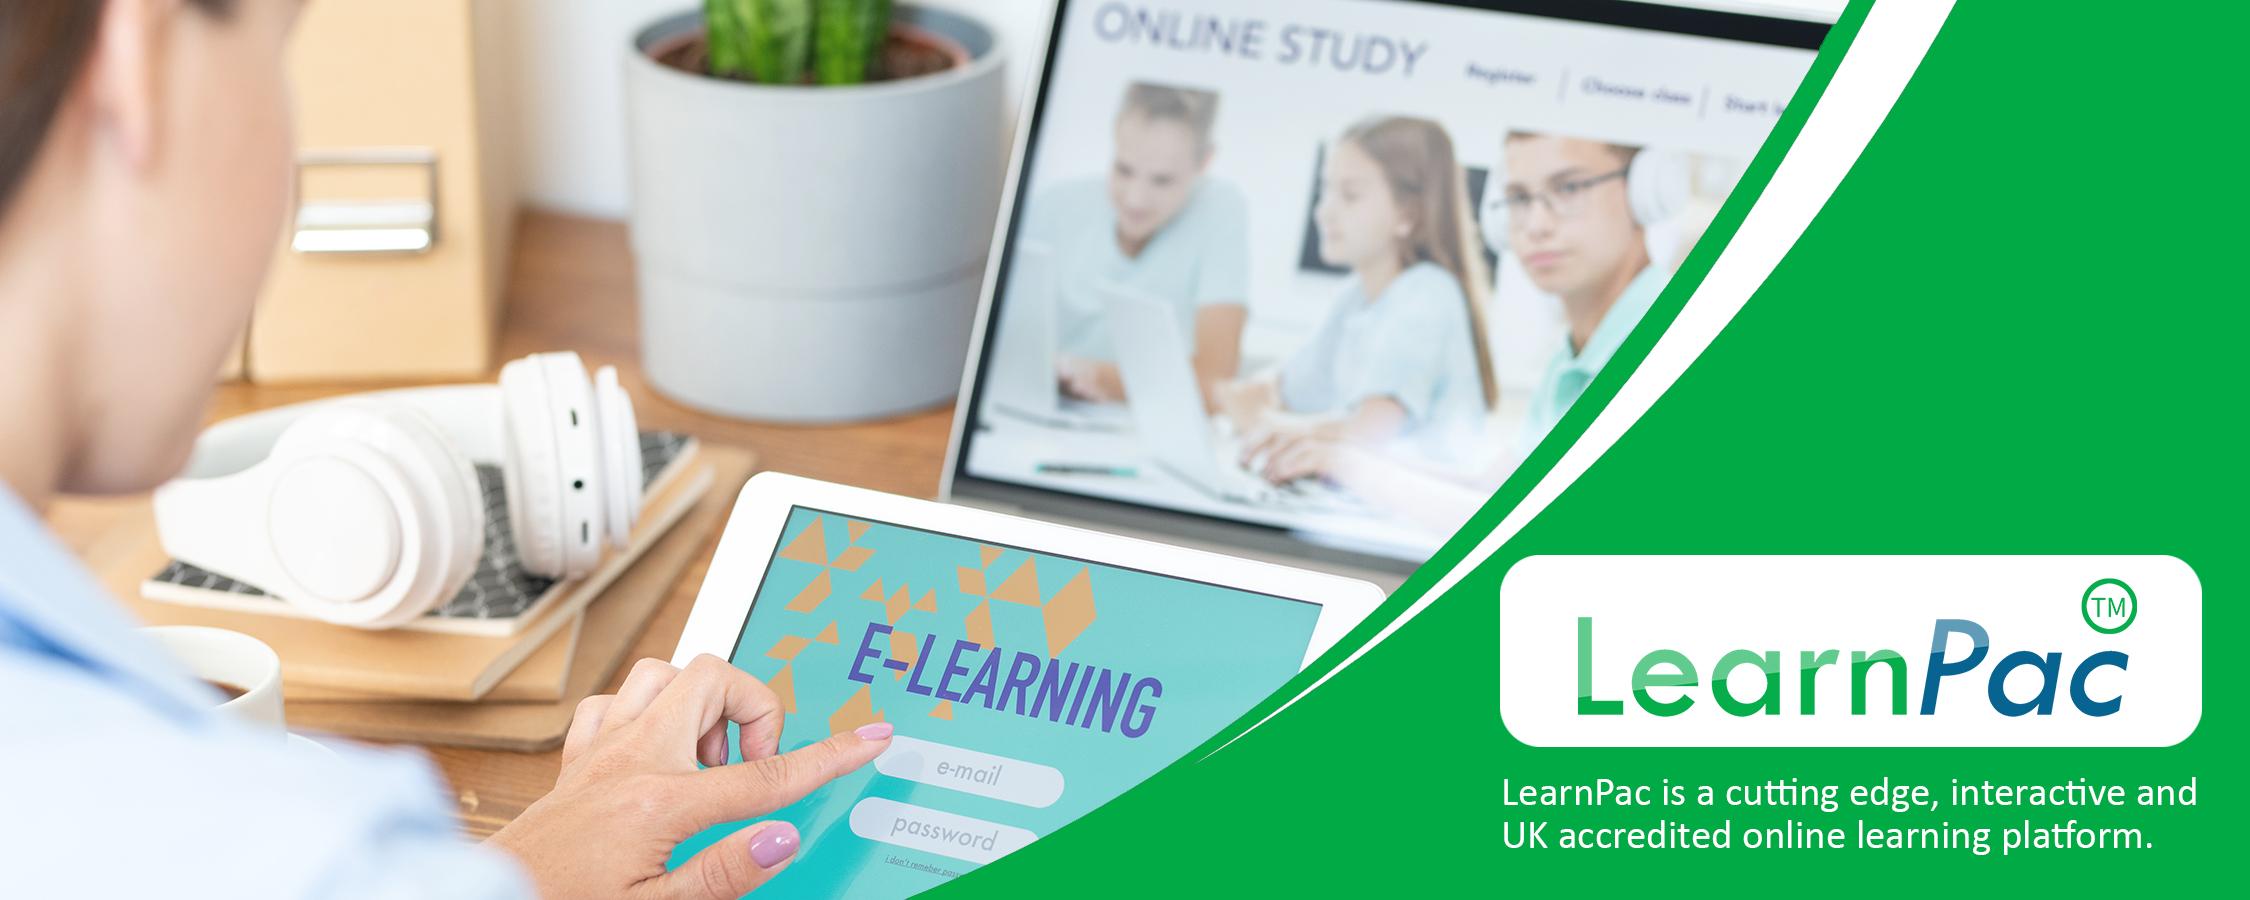 Digital Citizenship Training - Online Learning Courses - E-Learning Courses - LearnPac Systems UK -